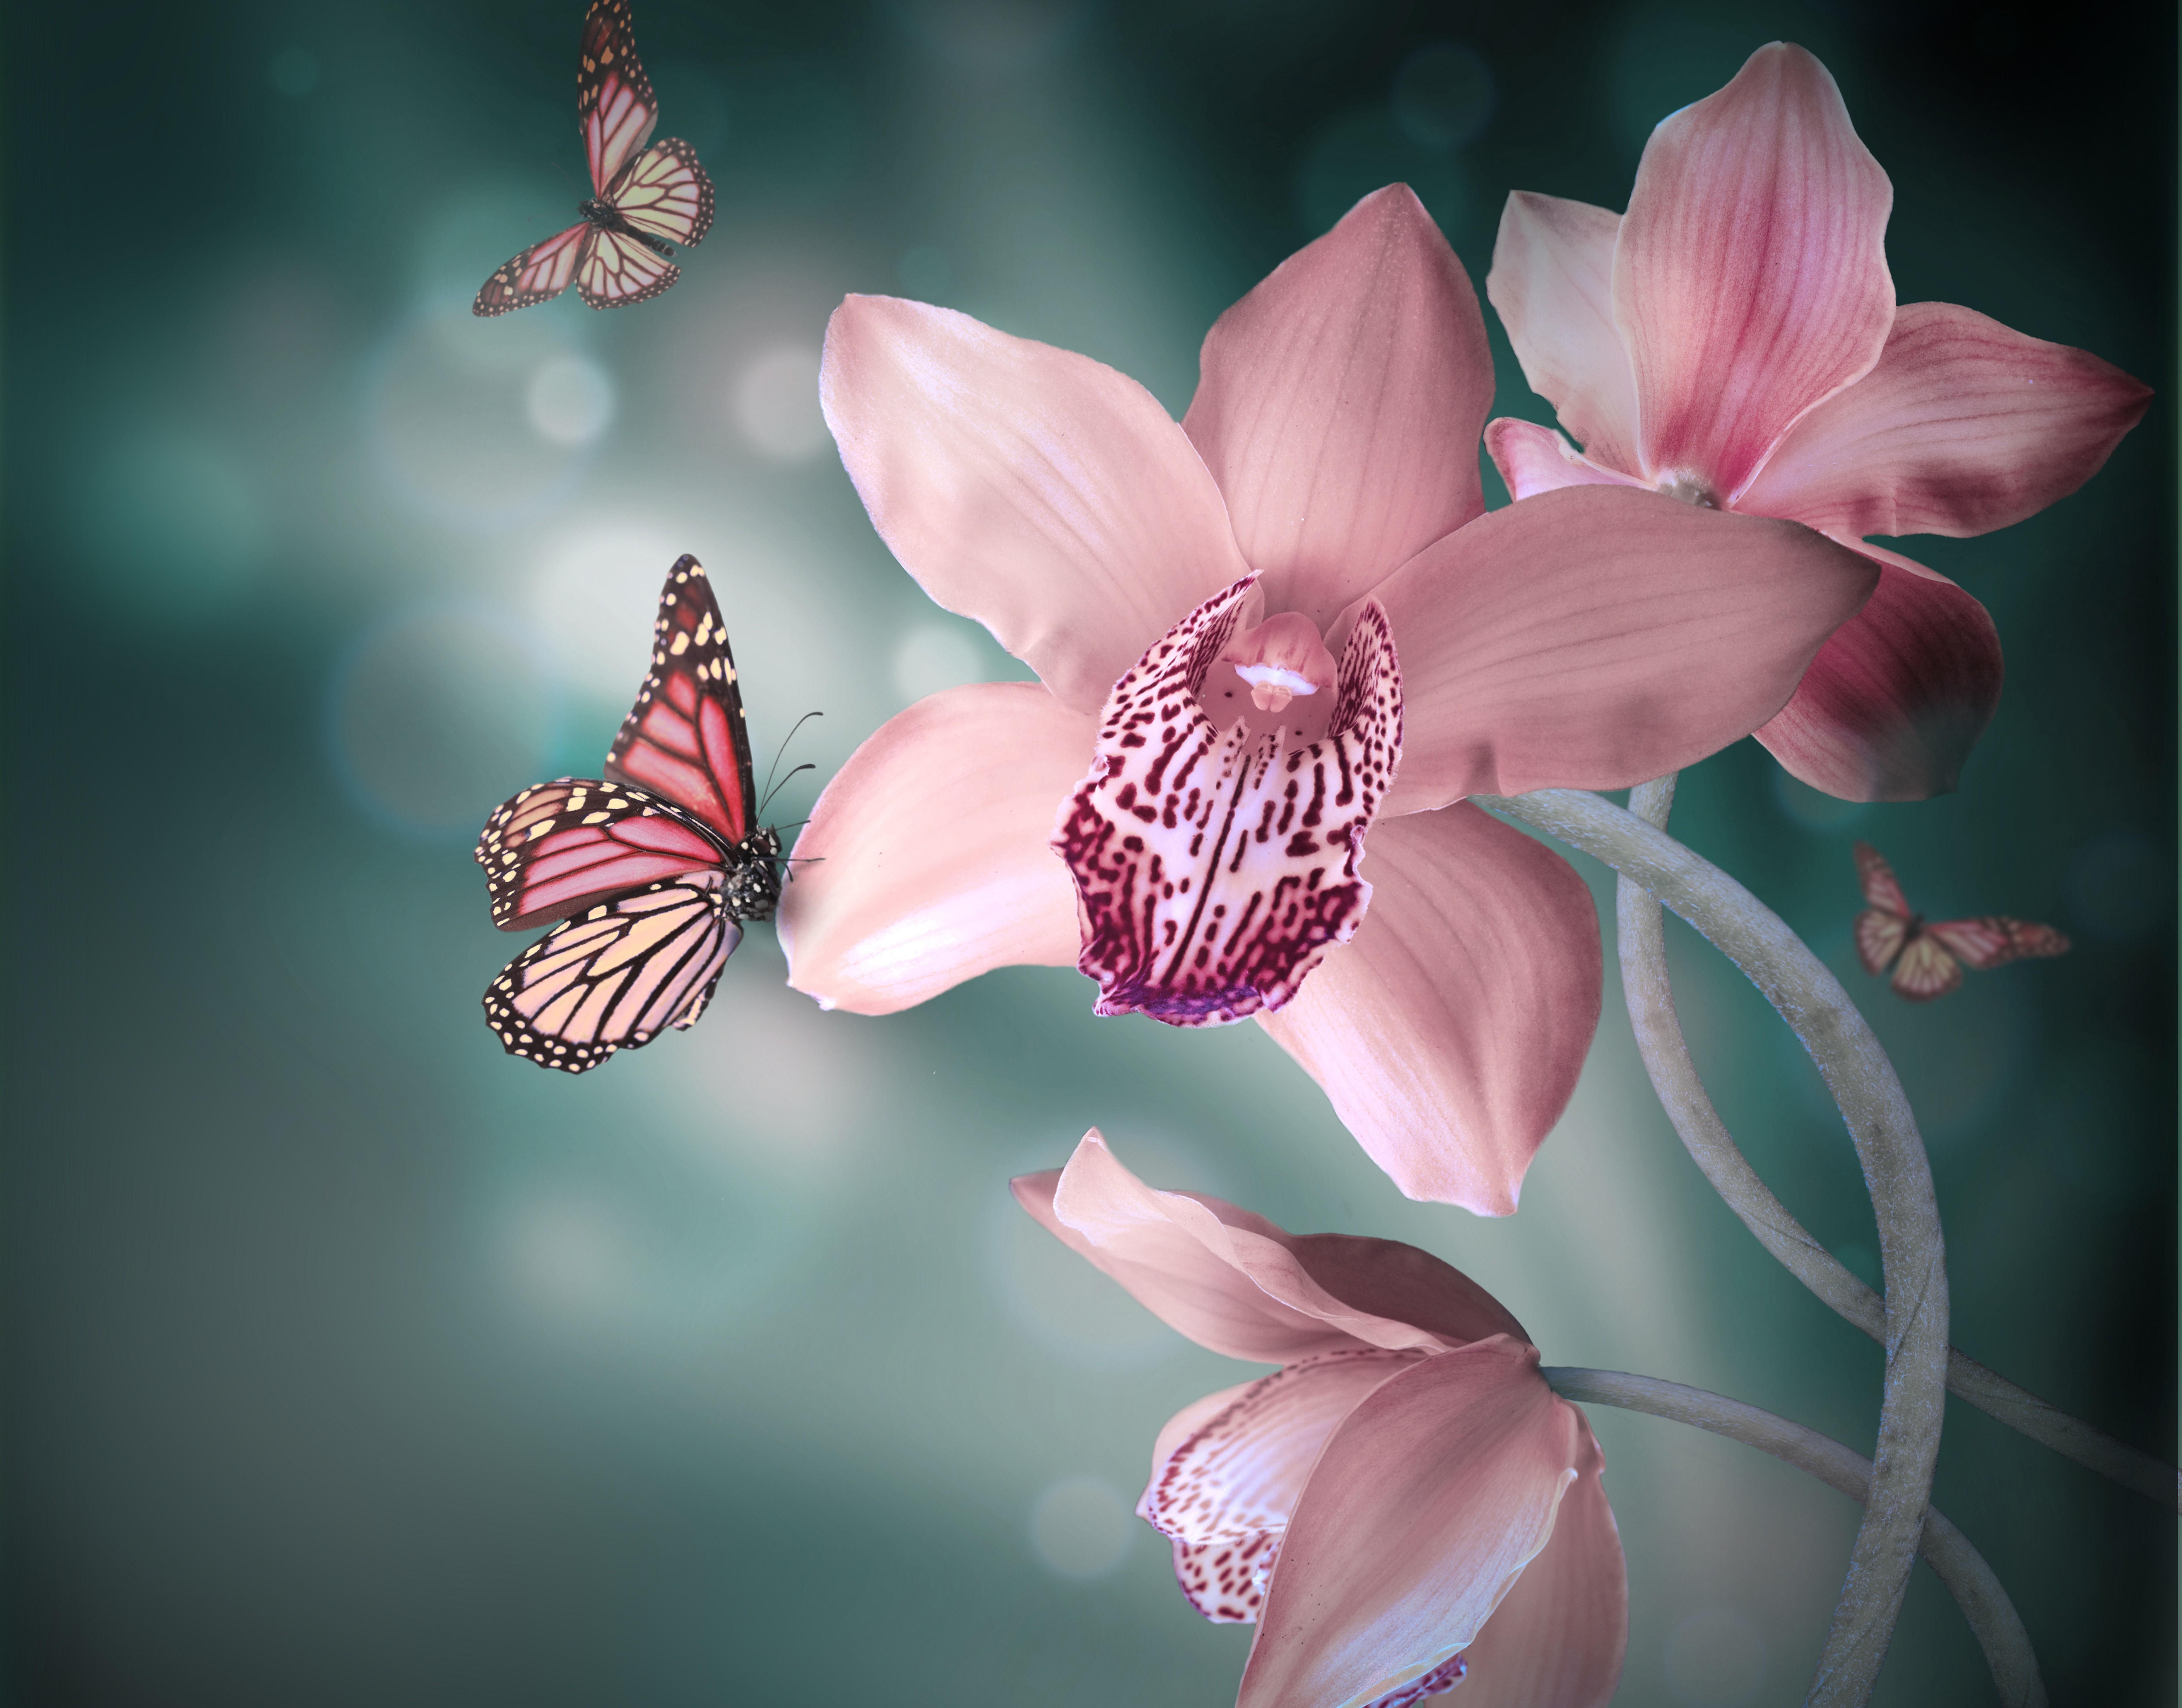 Wallpaper orchidee weiß  Orchidee 5k Retina Ultra HD Wallpaper and Hintergrund   7452x5834 ...